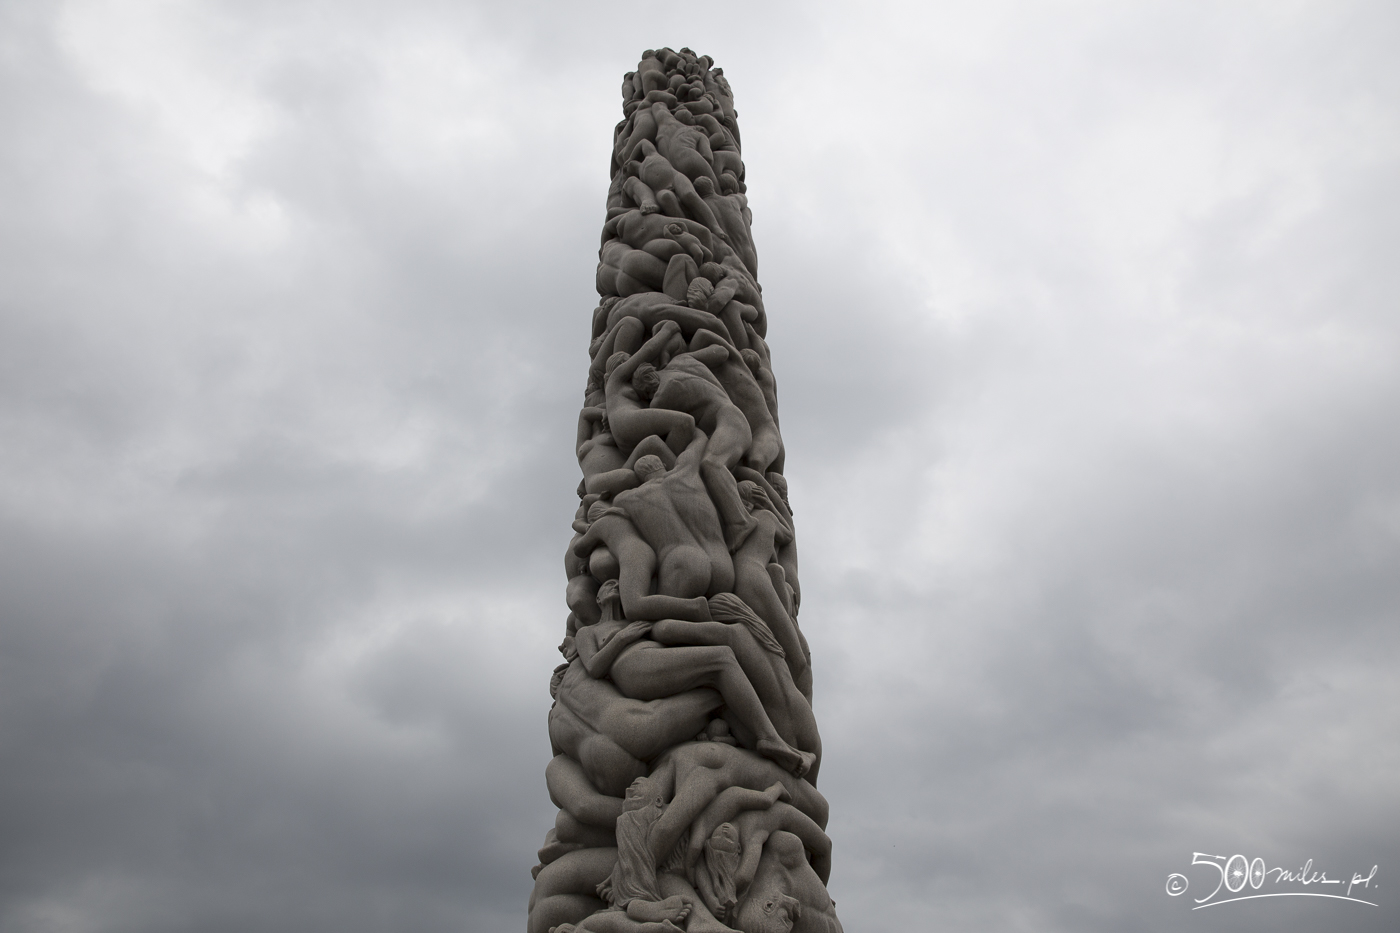 Oslo - Vigeland Park - Monolith close-up